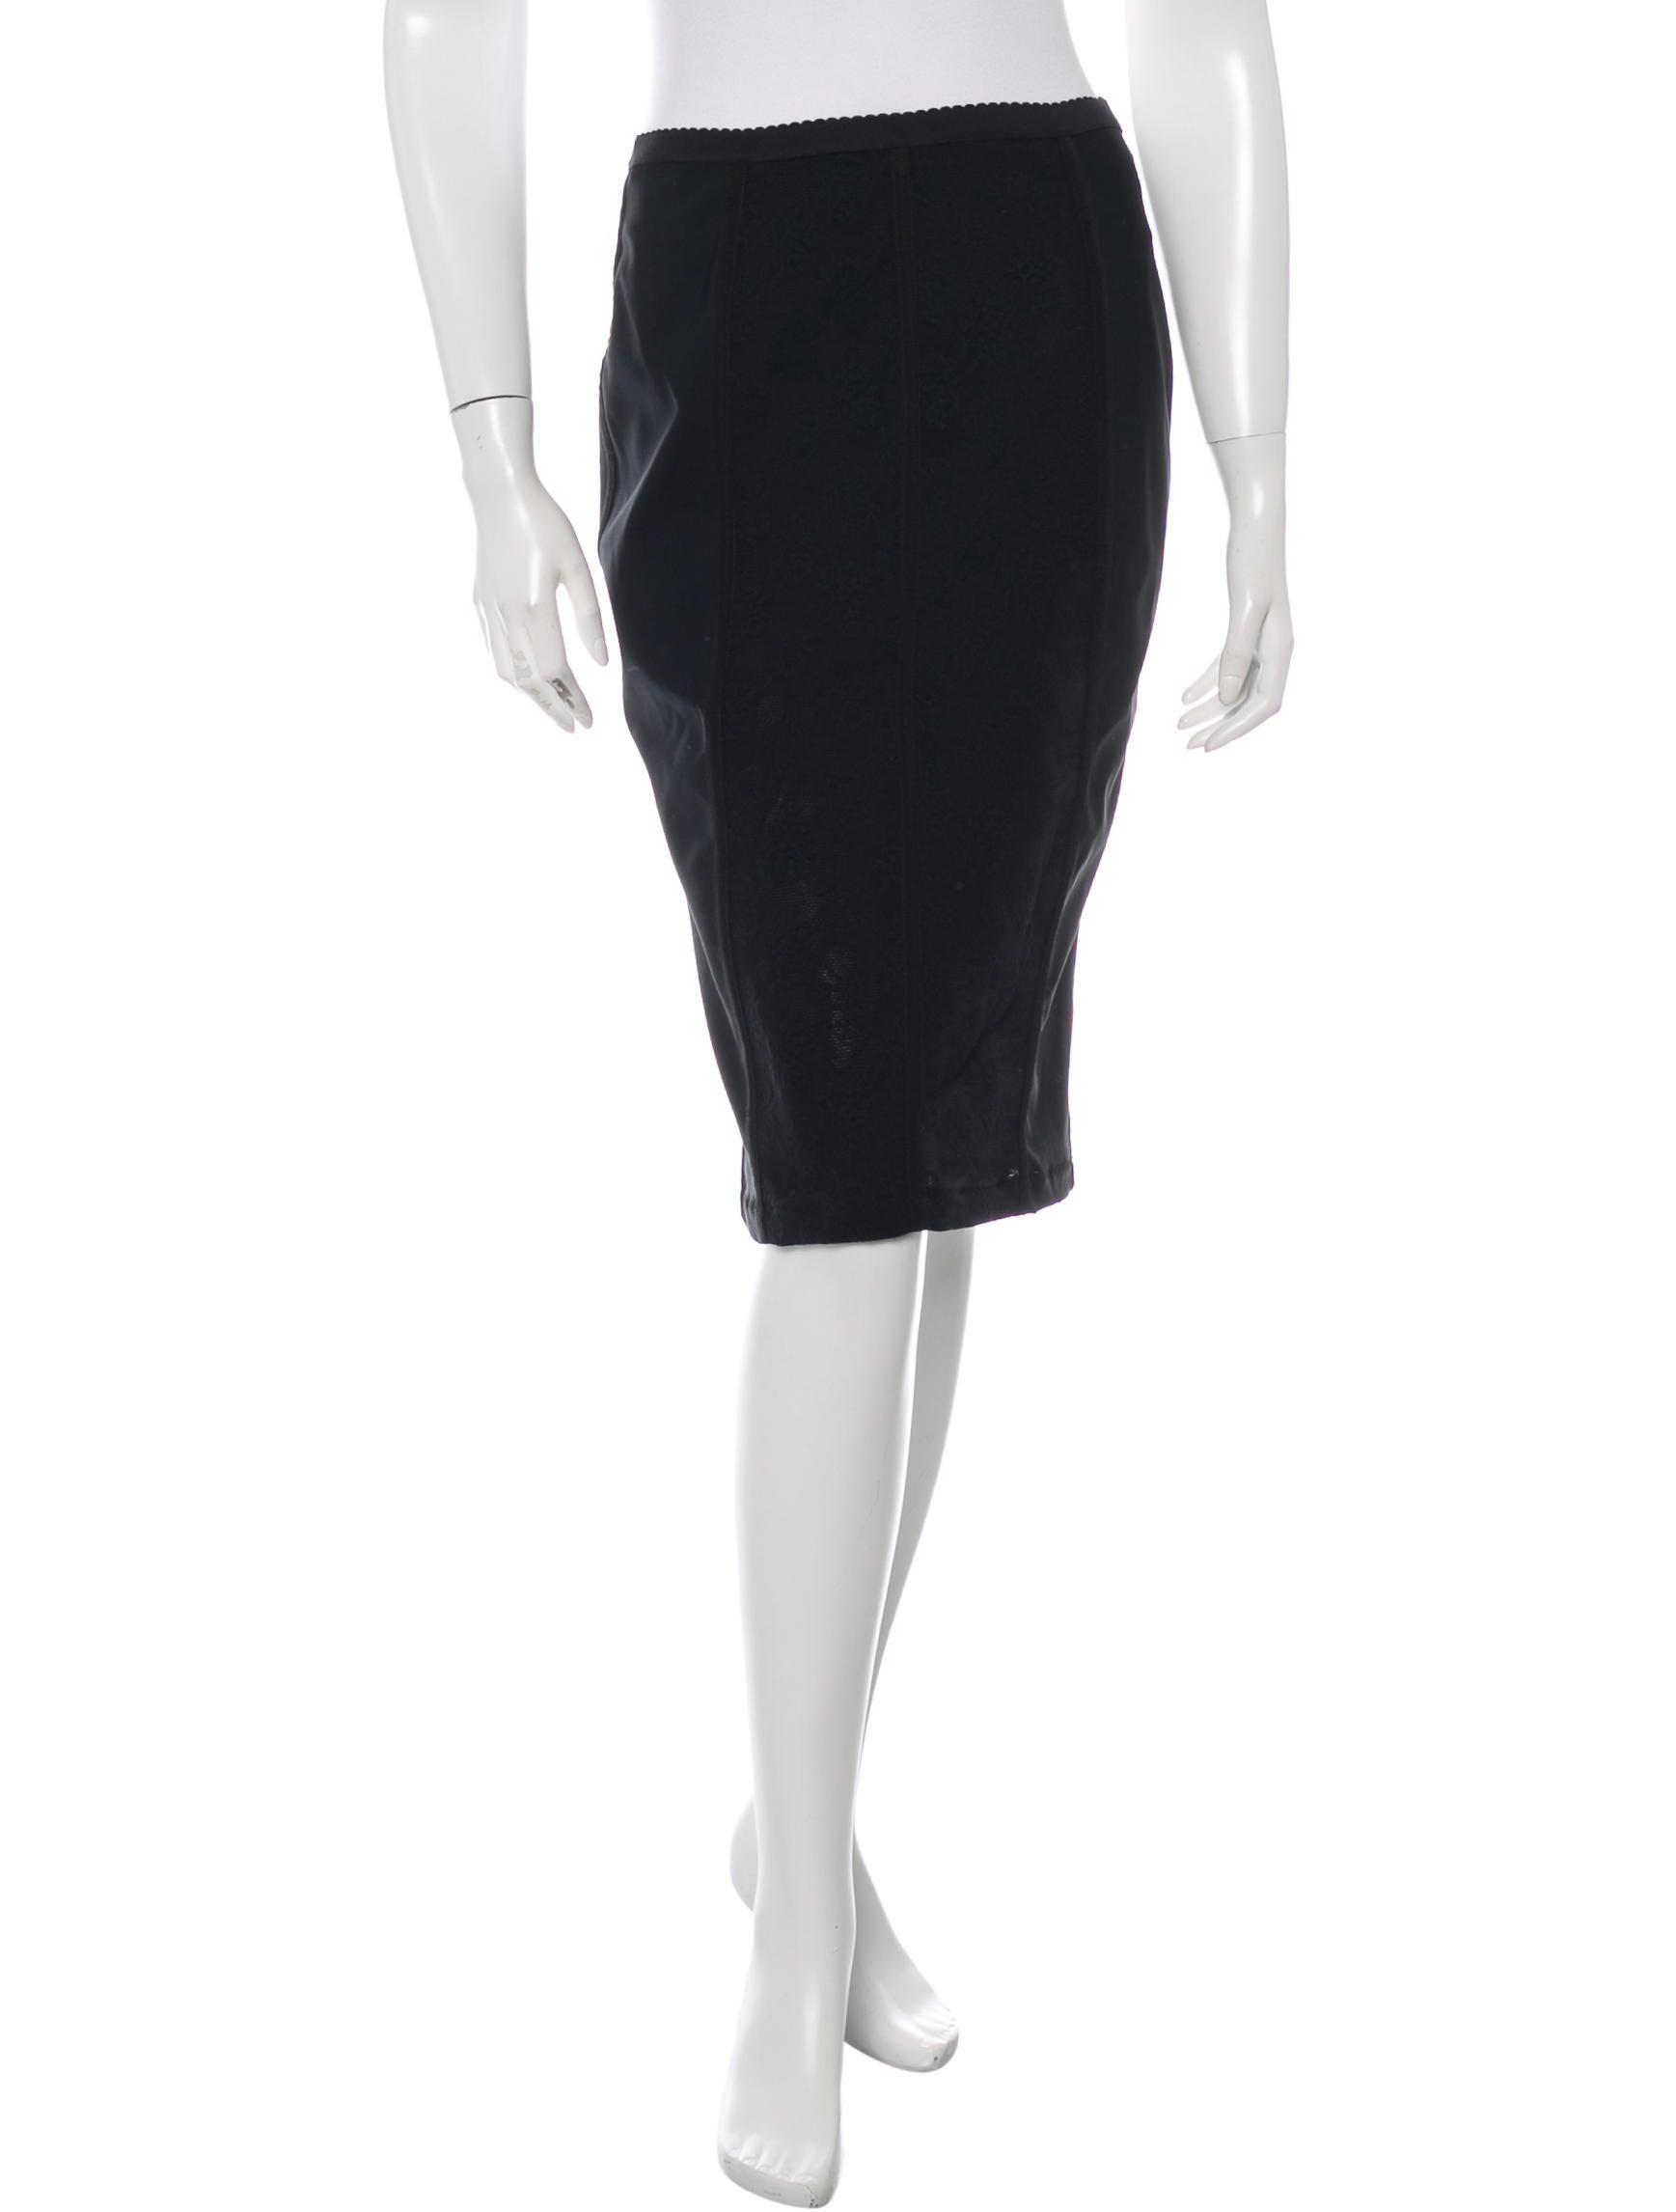 d g lace trim pencil skirt w tags clothing wdg30412